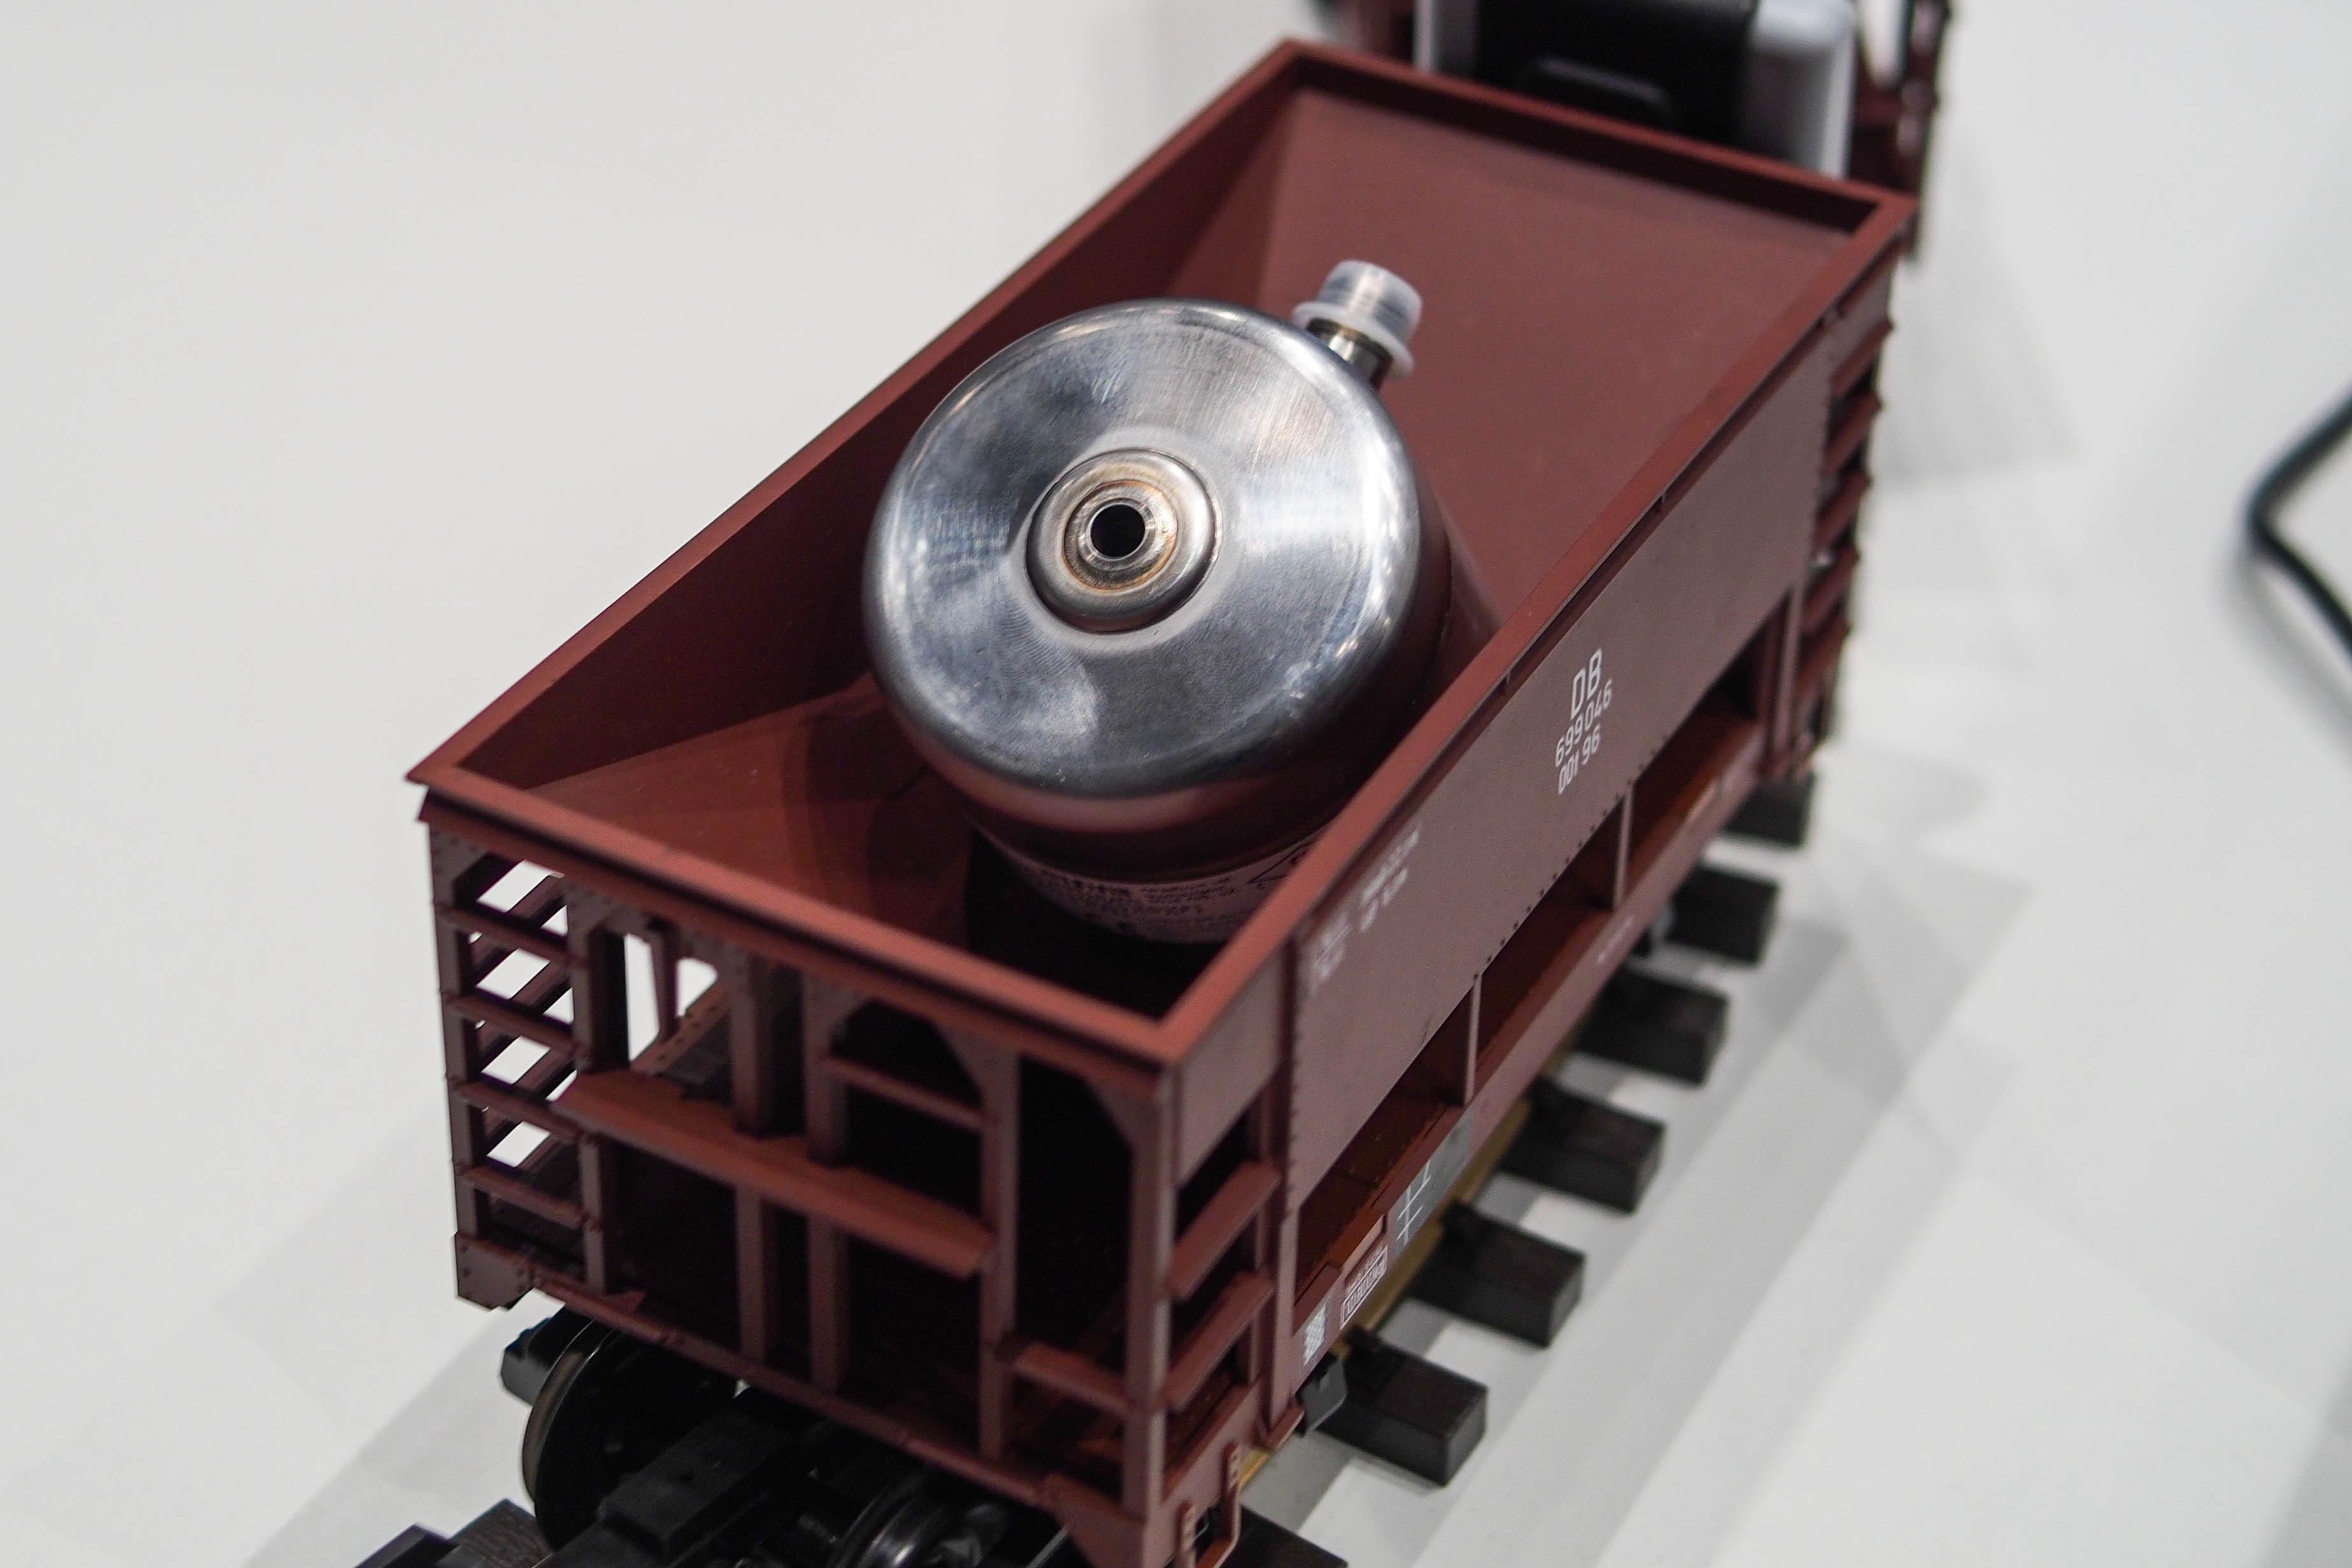 Perpetuum train sensor